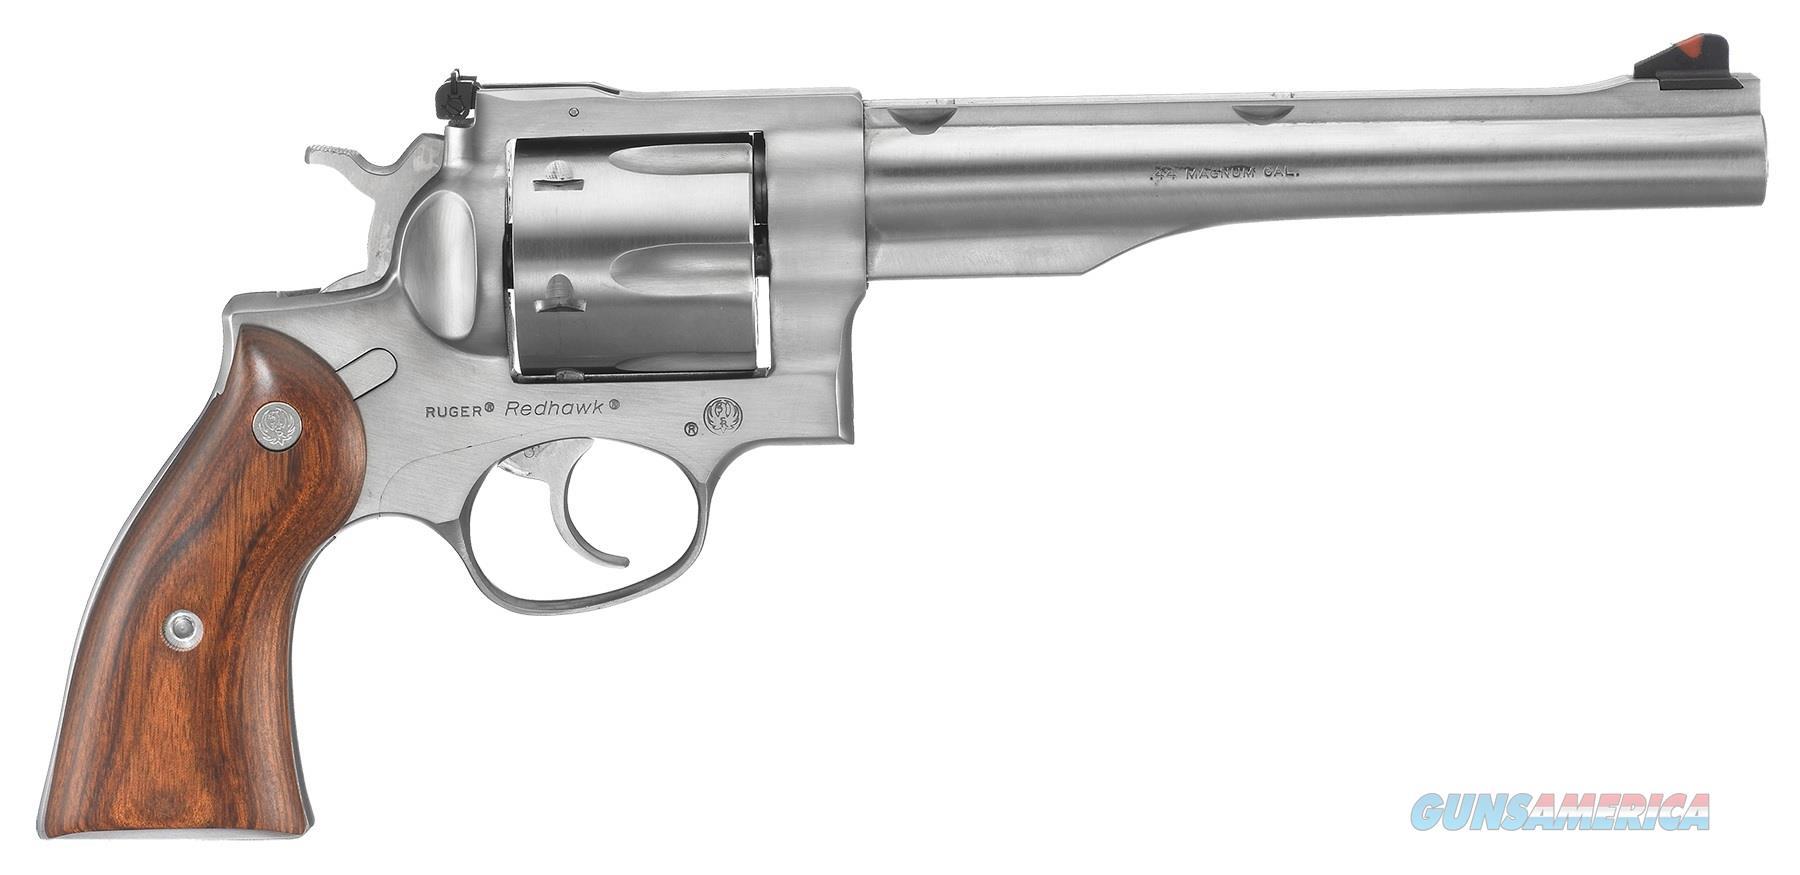 "Ruger Redhawk .44 Rem Mag 7.5"" SS 6 Rds 5003   Guns > Pistols > Ruger Double Action Revolver > Redhawk Type"